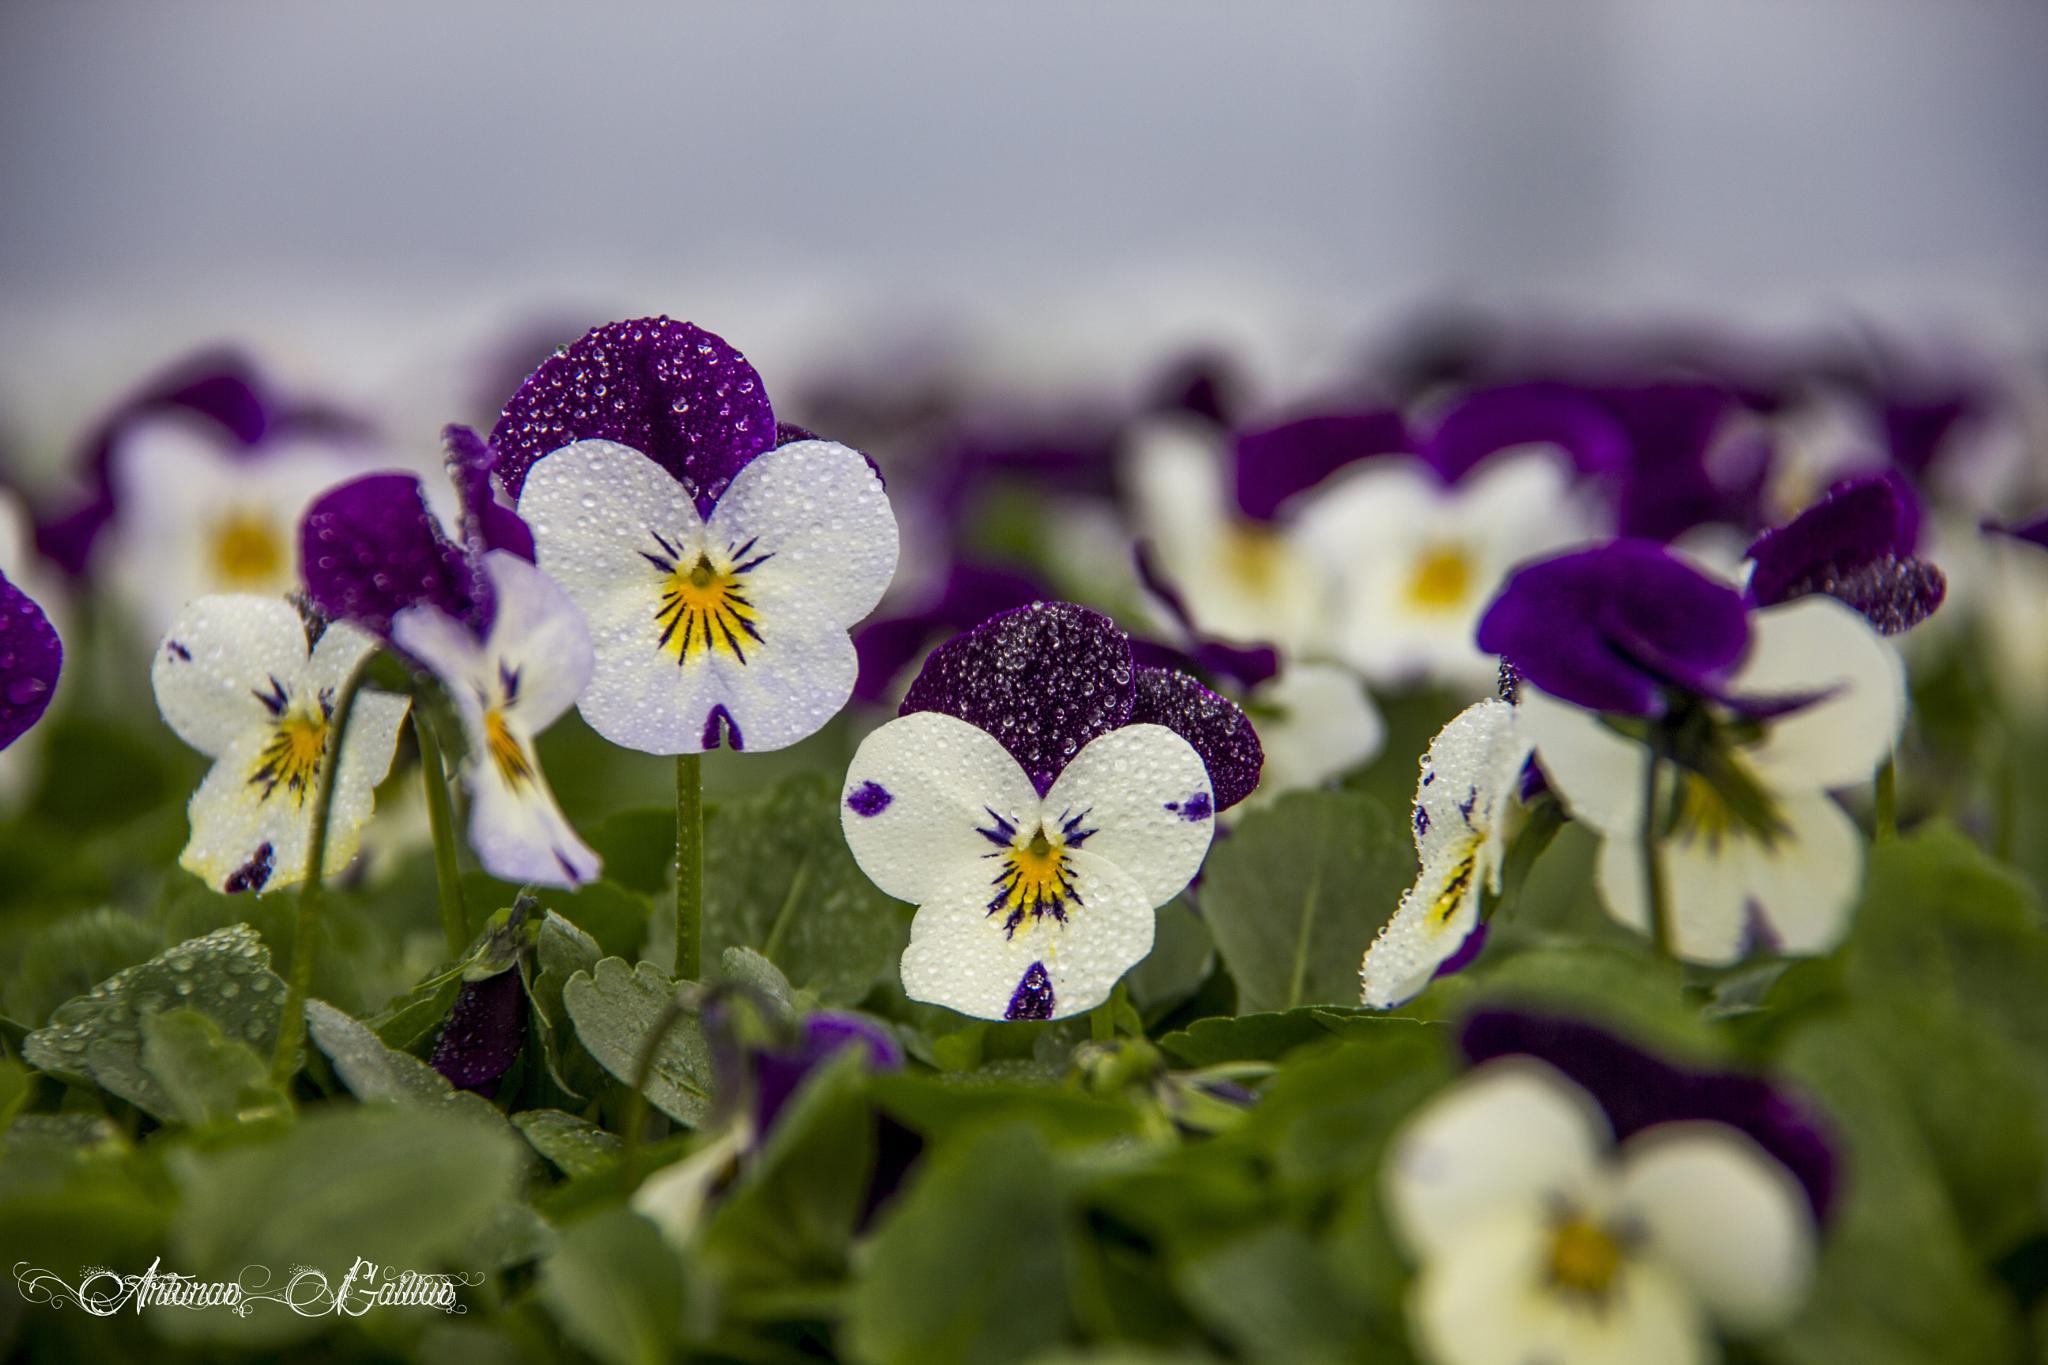 Viola cornuta (white jump up) by Arturas Gailius